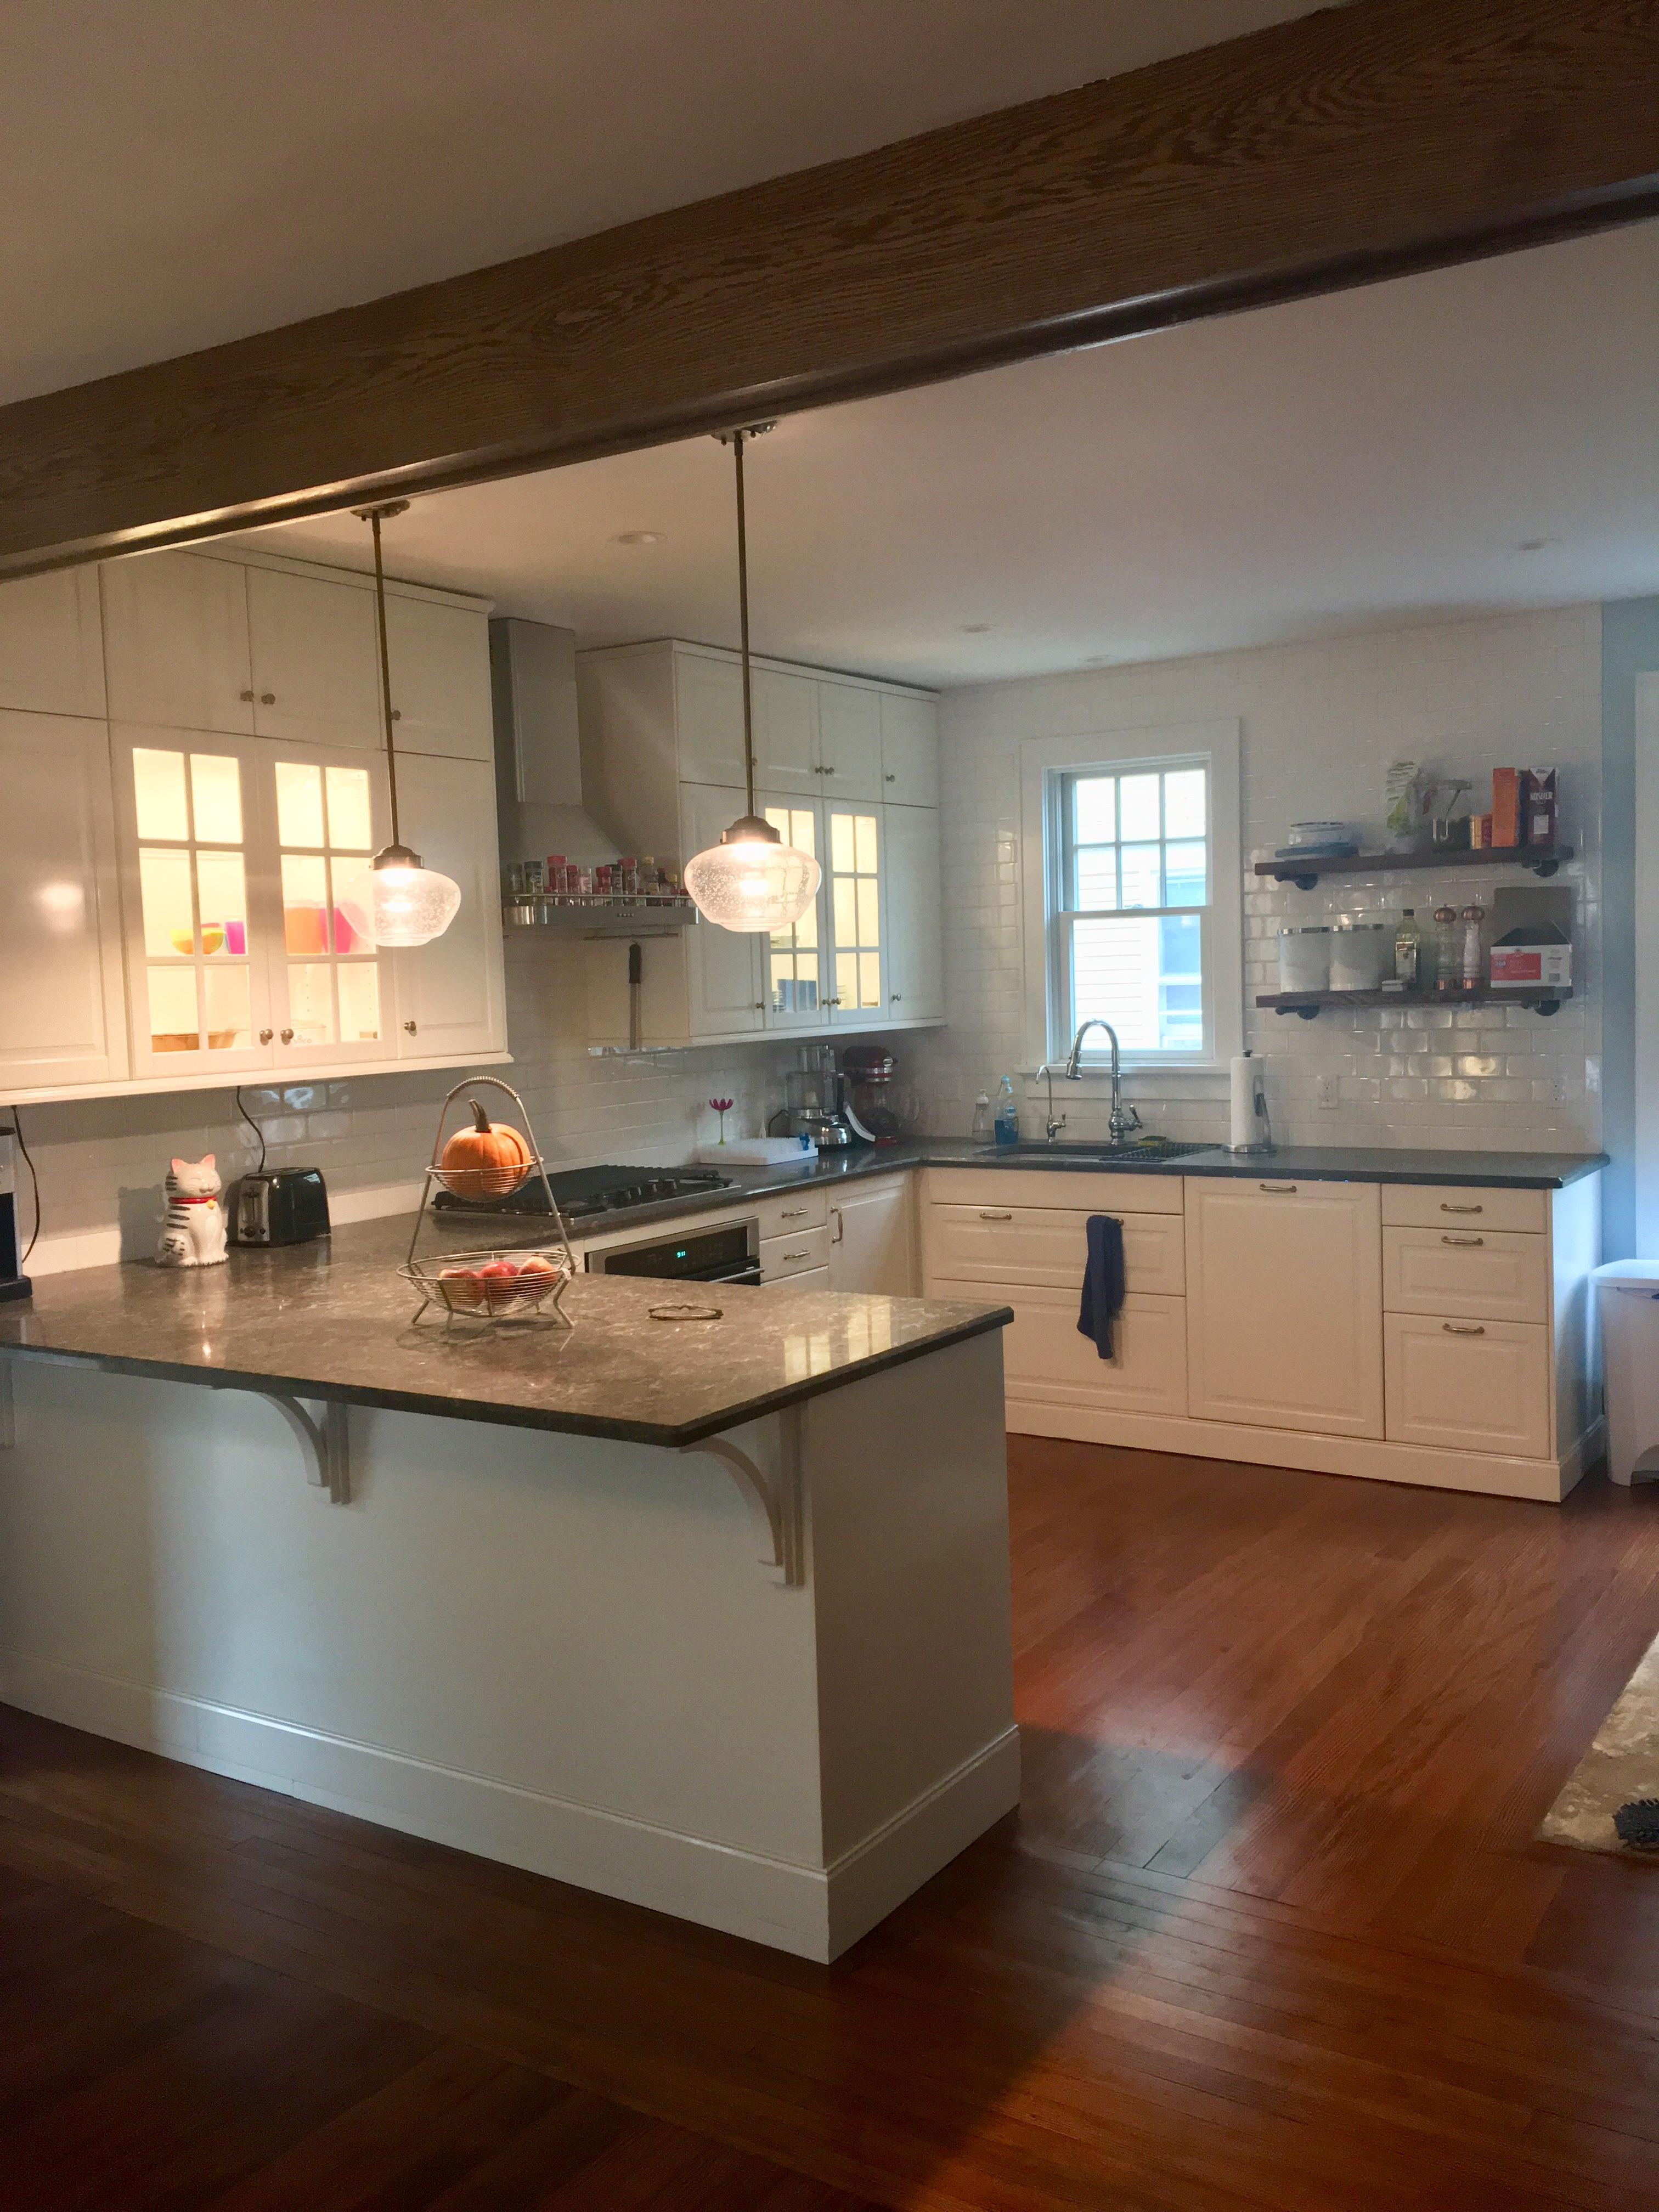 ikea kitchen remodel trends in flooring nj amateurroomporn